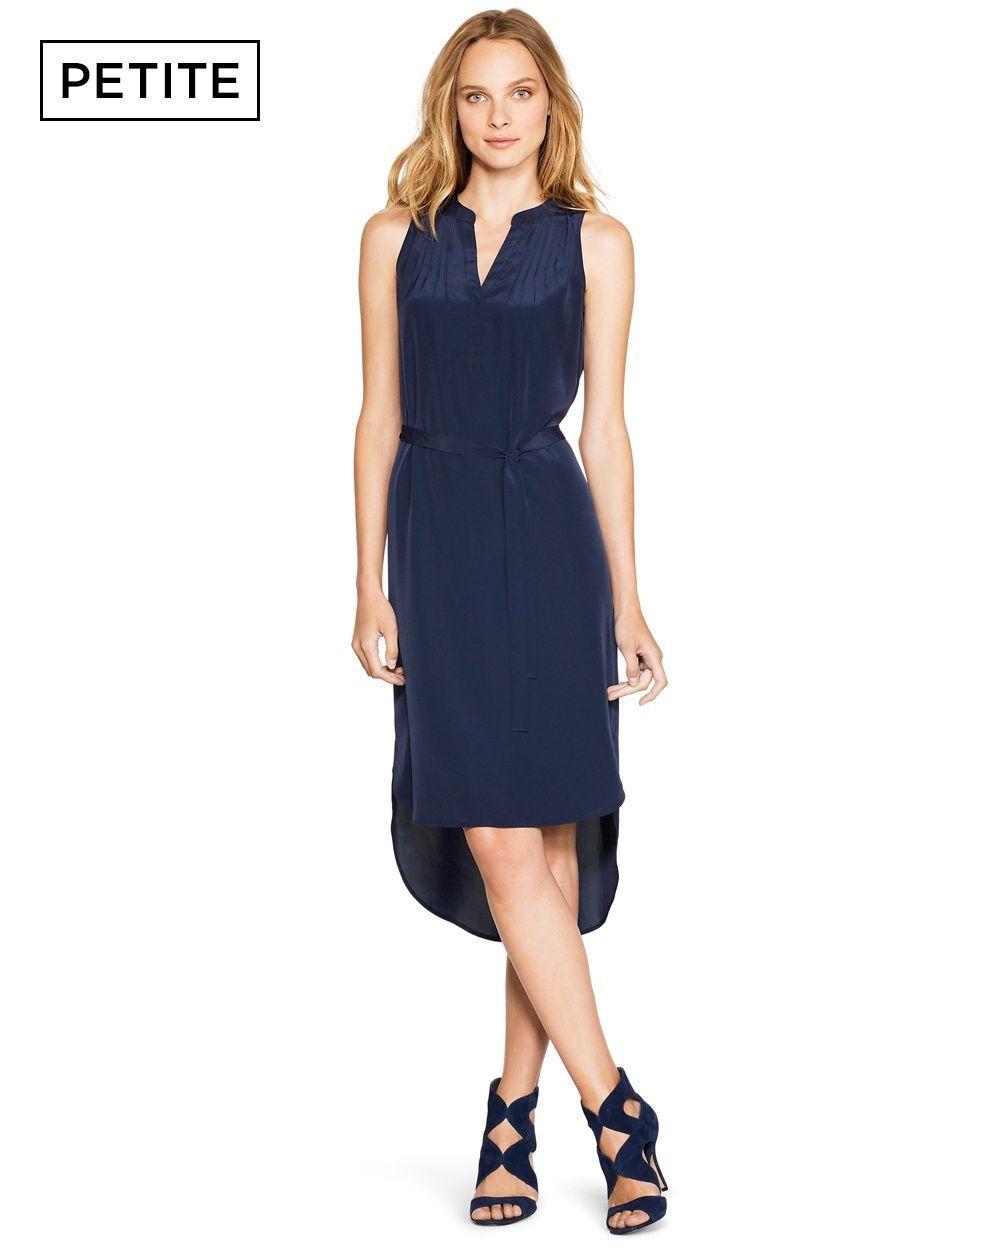 51a5c9f599ef Petite Sleeveless Midi Shirtdress. Petite Sleeveless Midi Shirtdress Dress  Skirt ...